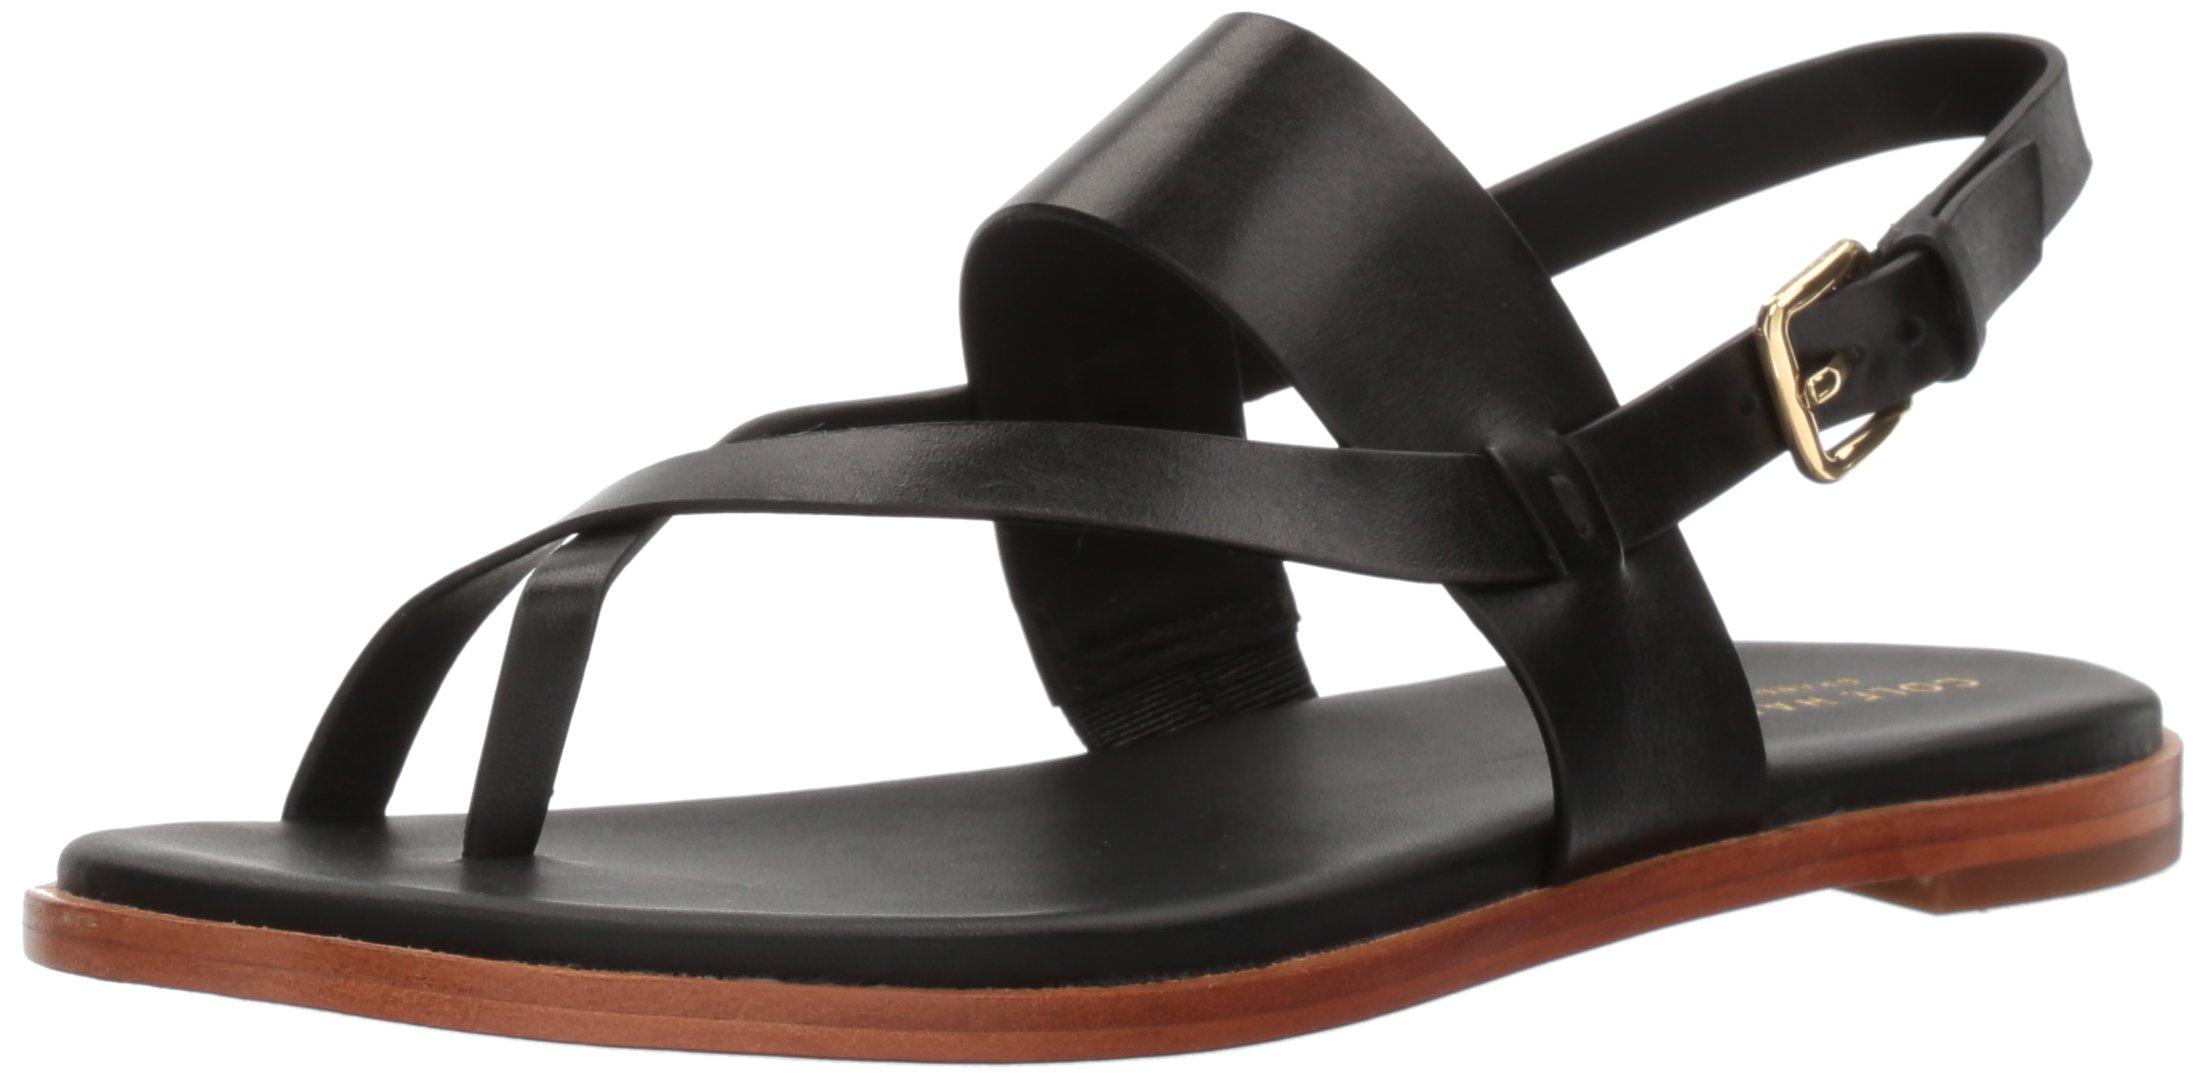 ویکالا · خرید  اصل اورجینال · خرید از آمازون · Cole Haan Women's Anica Thong Sandal Flat, Black, 8 B US wekala · ویکالا